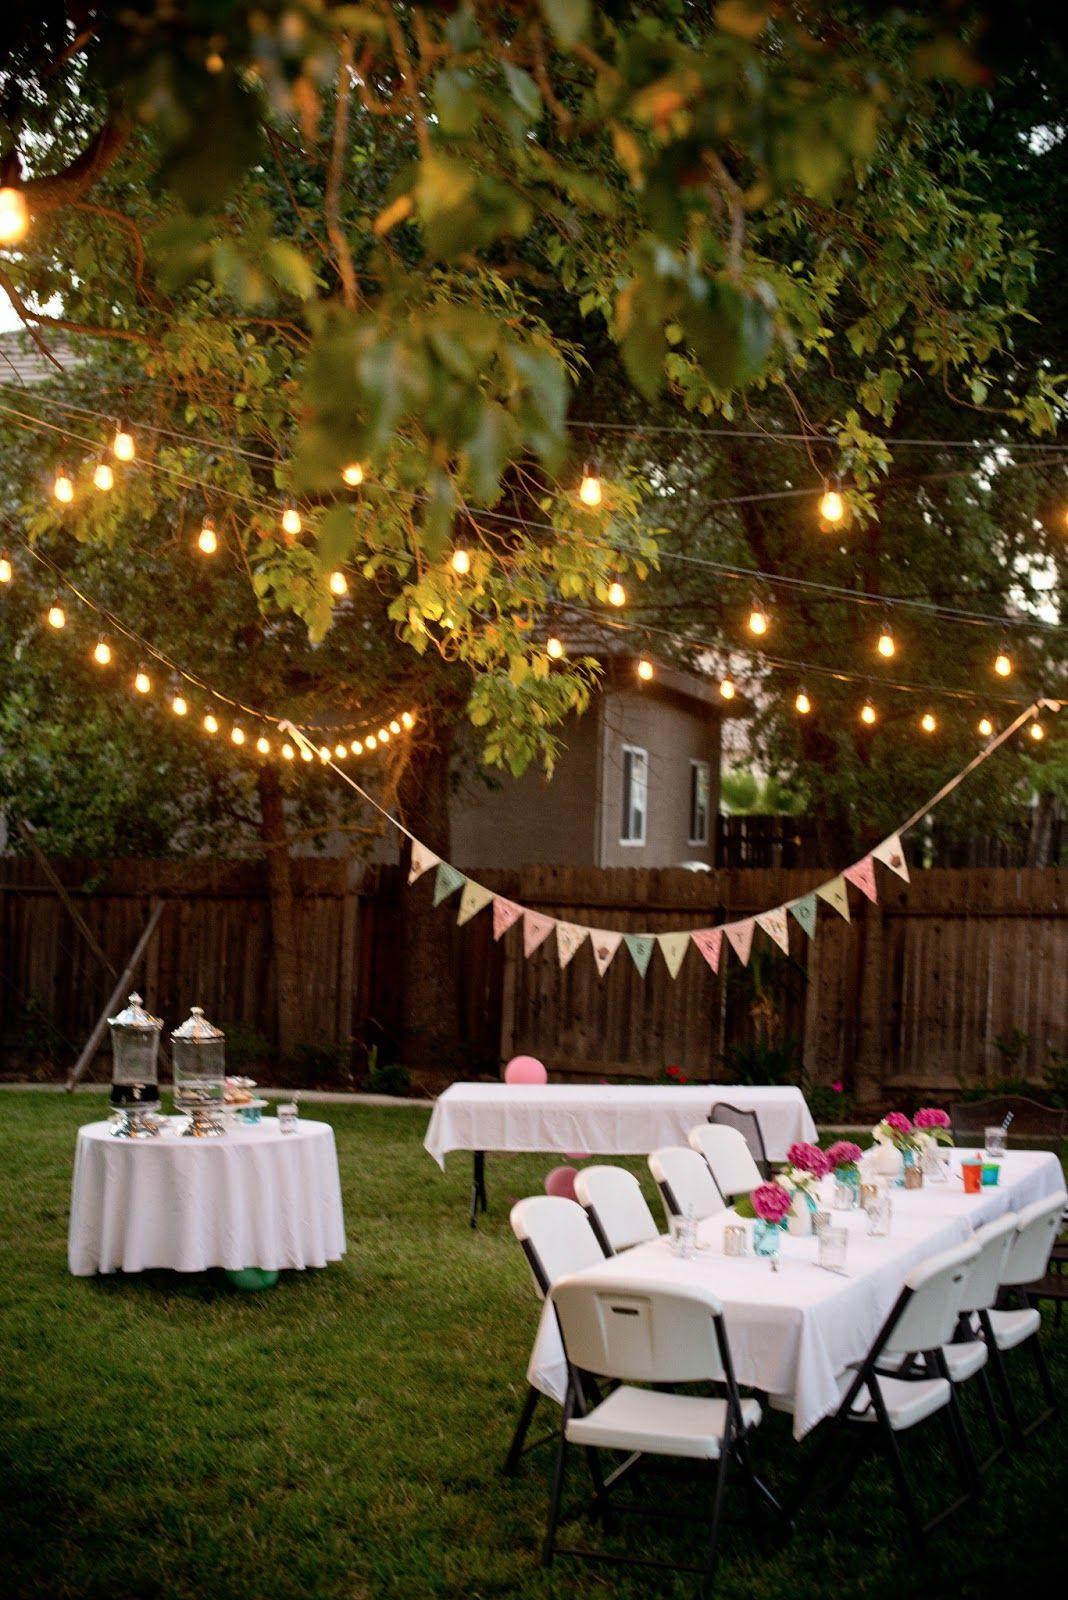 Backyard Party Ideas For Graduation  Backyard Birthday Fun Pink Hydrangeas Polka Dot Napkins